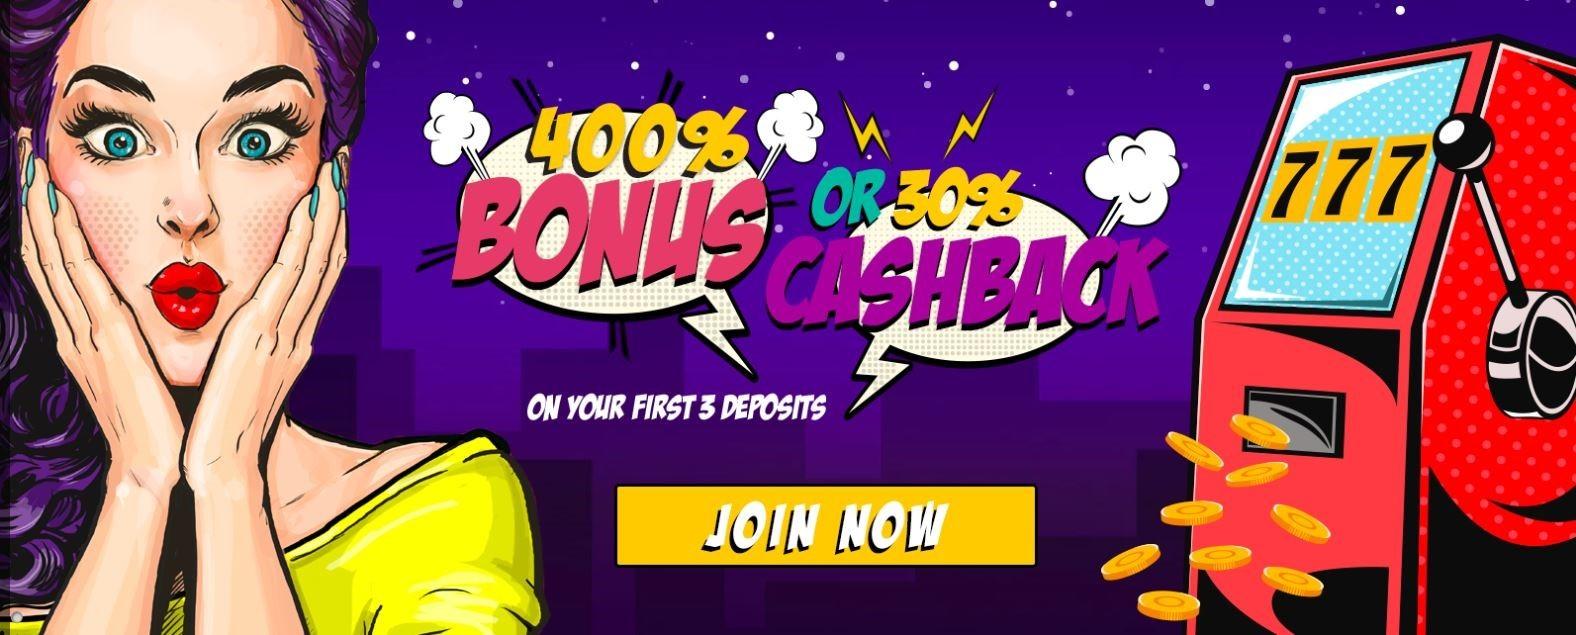 Casino Fantastik : 21€ + 50 Freespins OFFERTS ICI ! (Juin 2020)